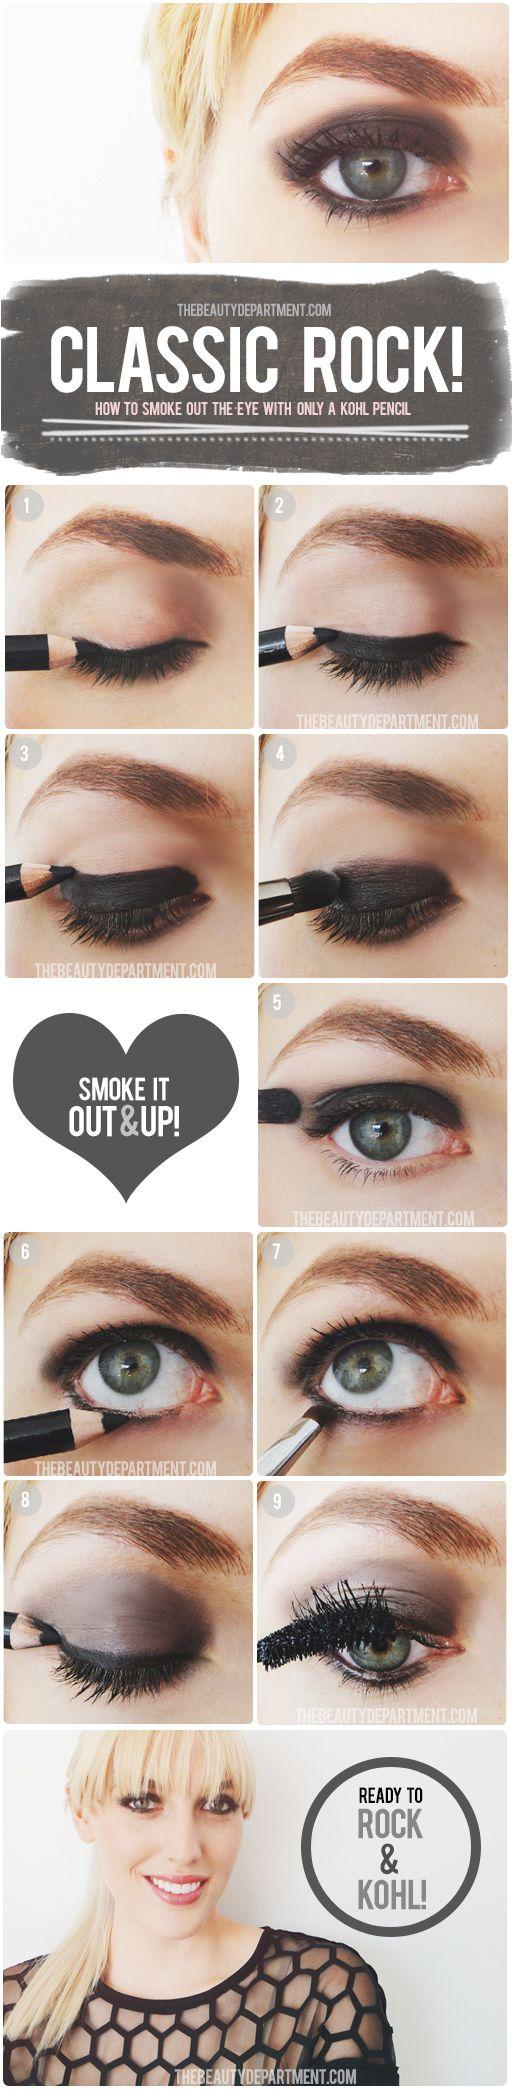 basic smoky eye tutorial with just kohl pencil + mascara!